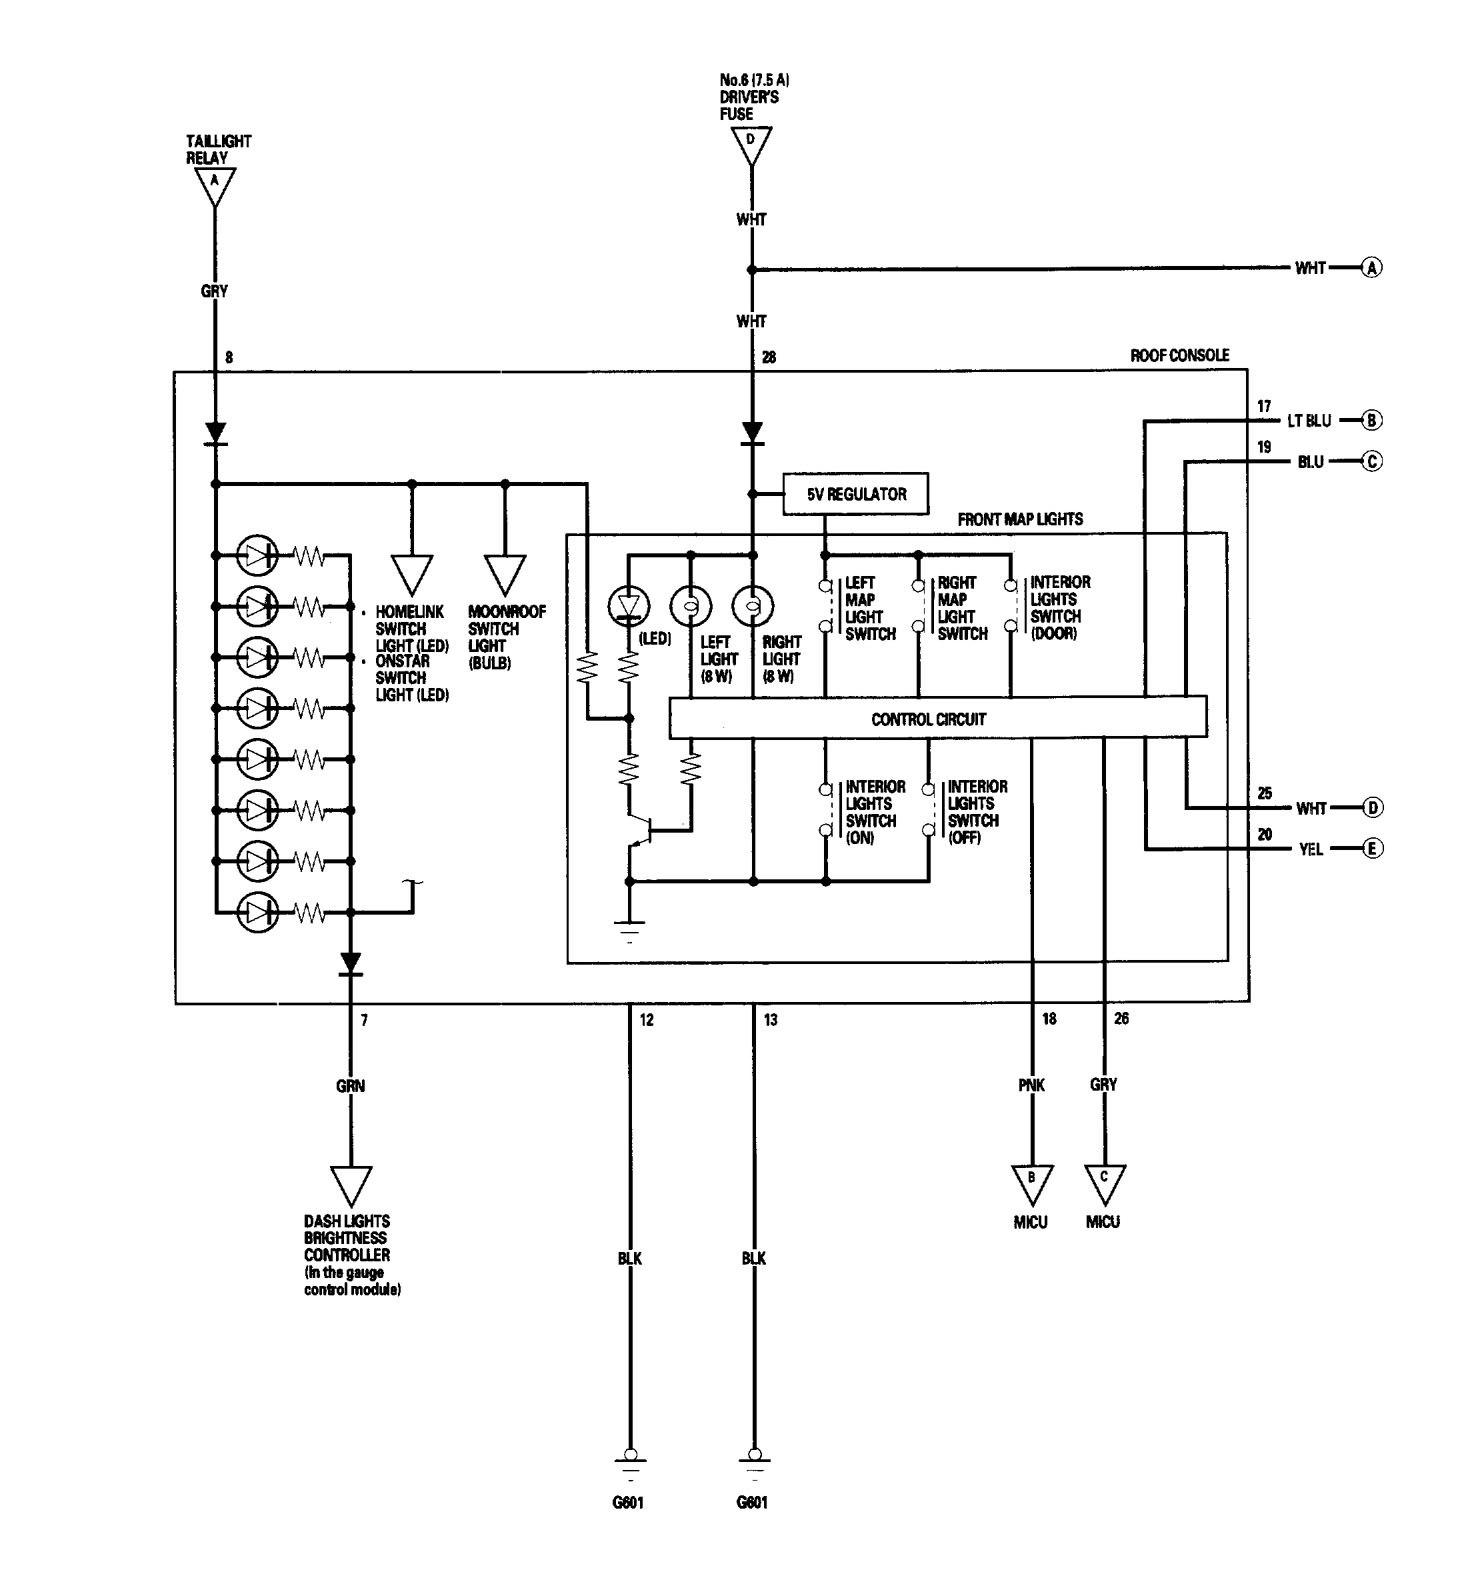 Acura Rl 2005 2006 Wiring Diagrams Interior Lighting Saab Diagram Part 6